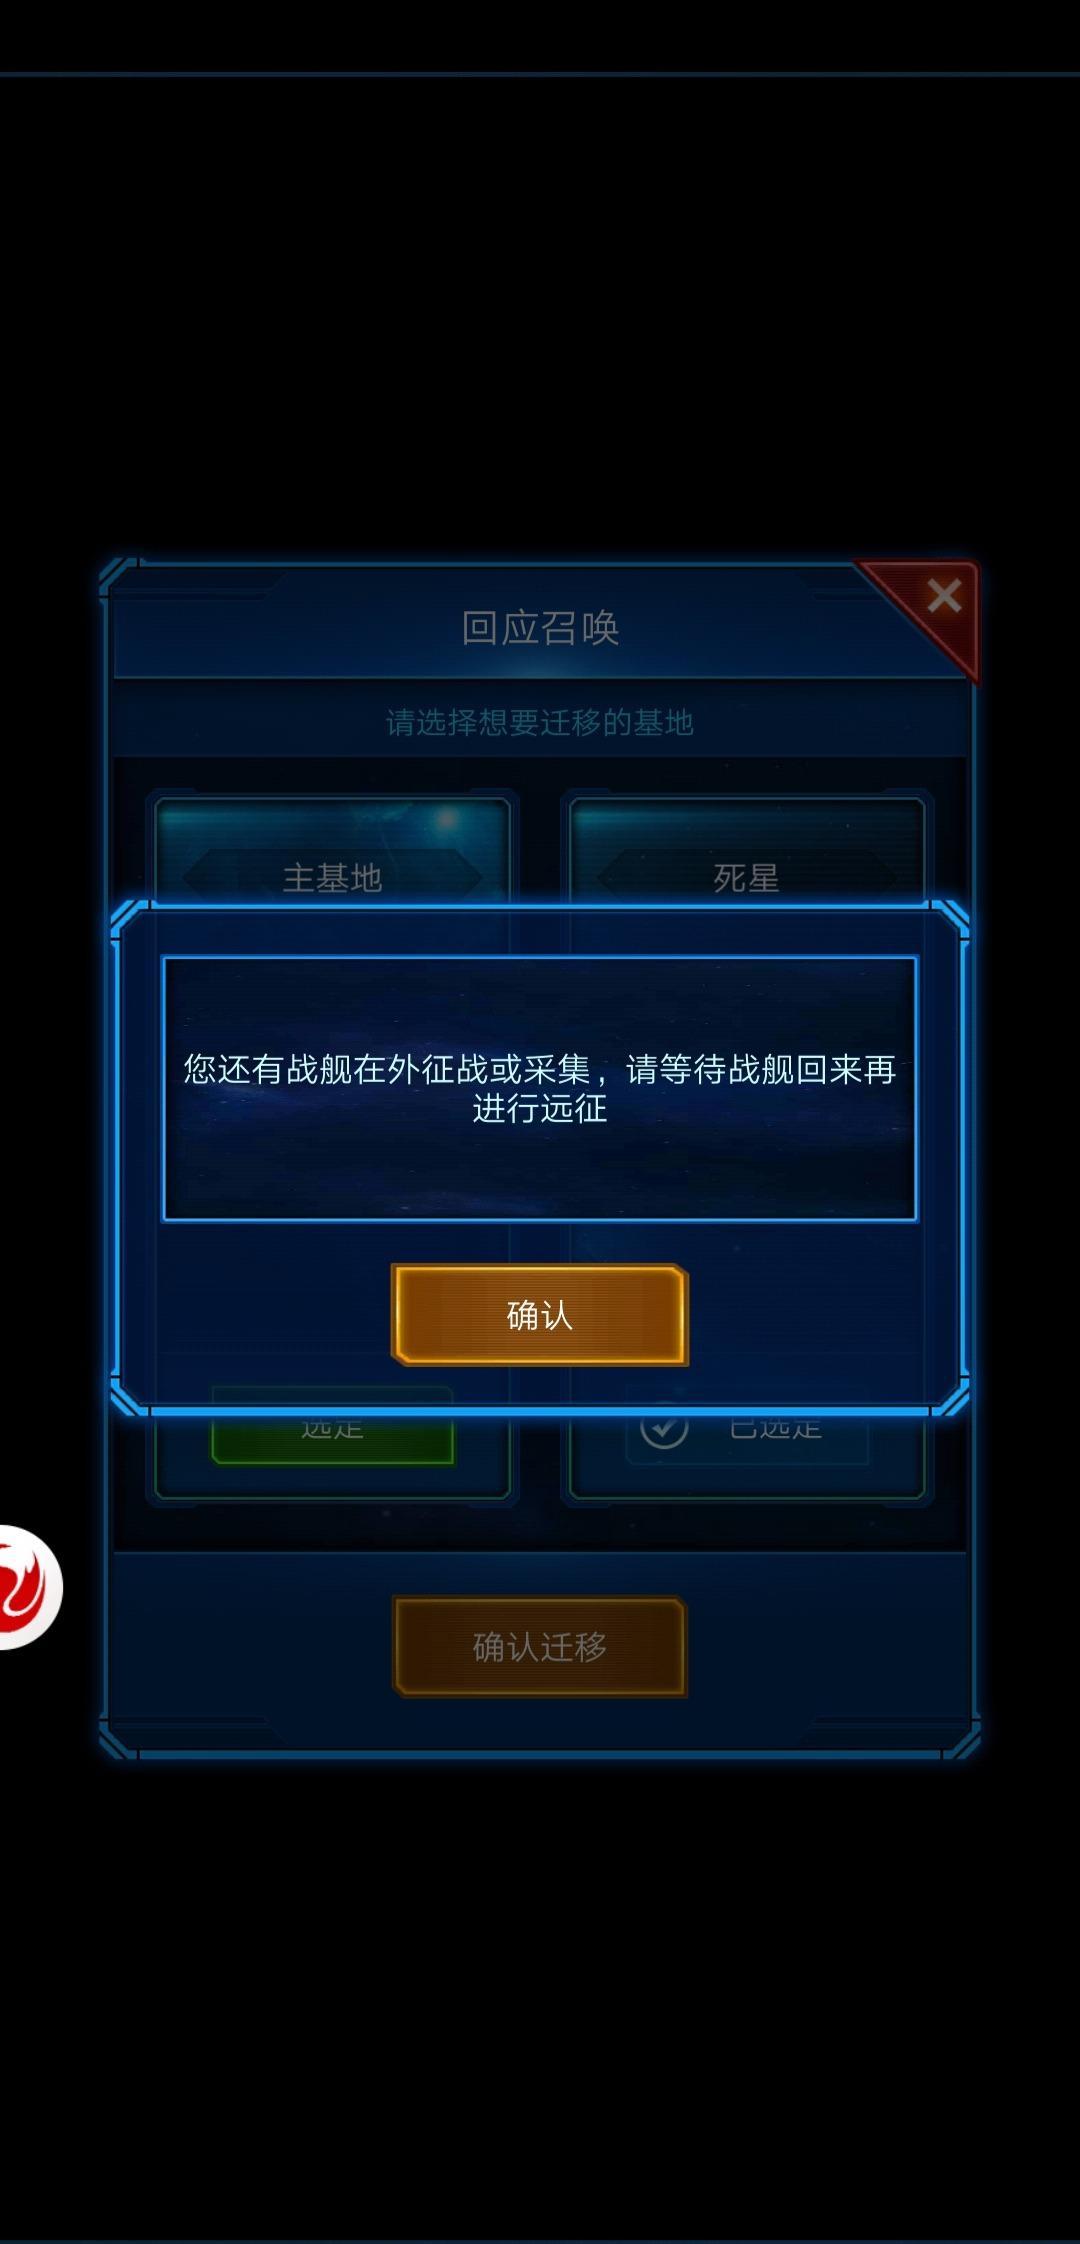 Screenshot_20190624_184138_com.jedigames.p16s.luobo.jpg